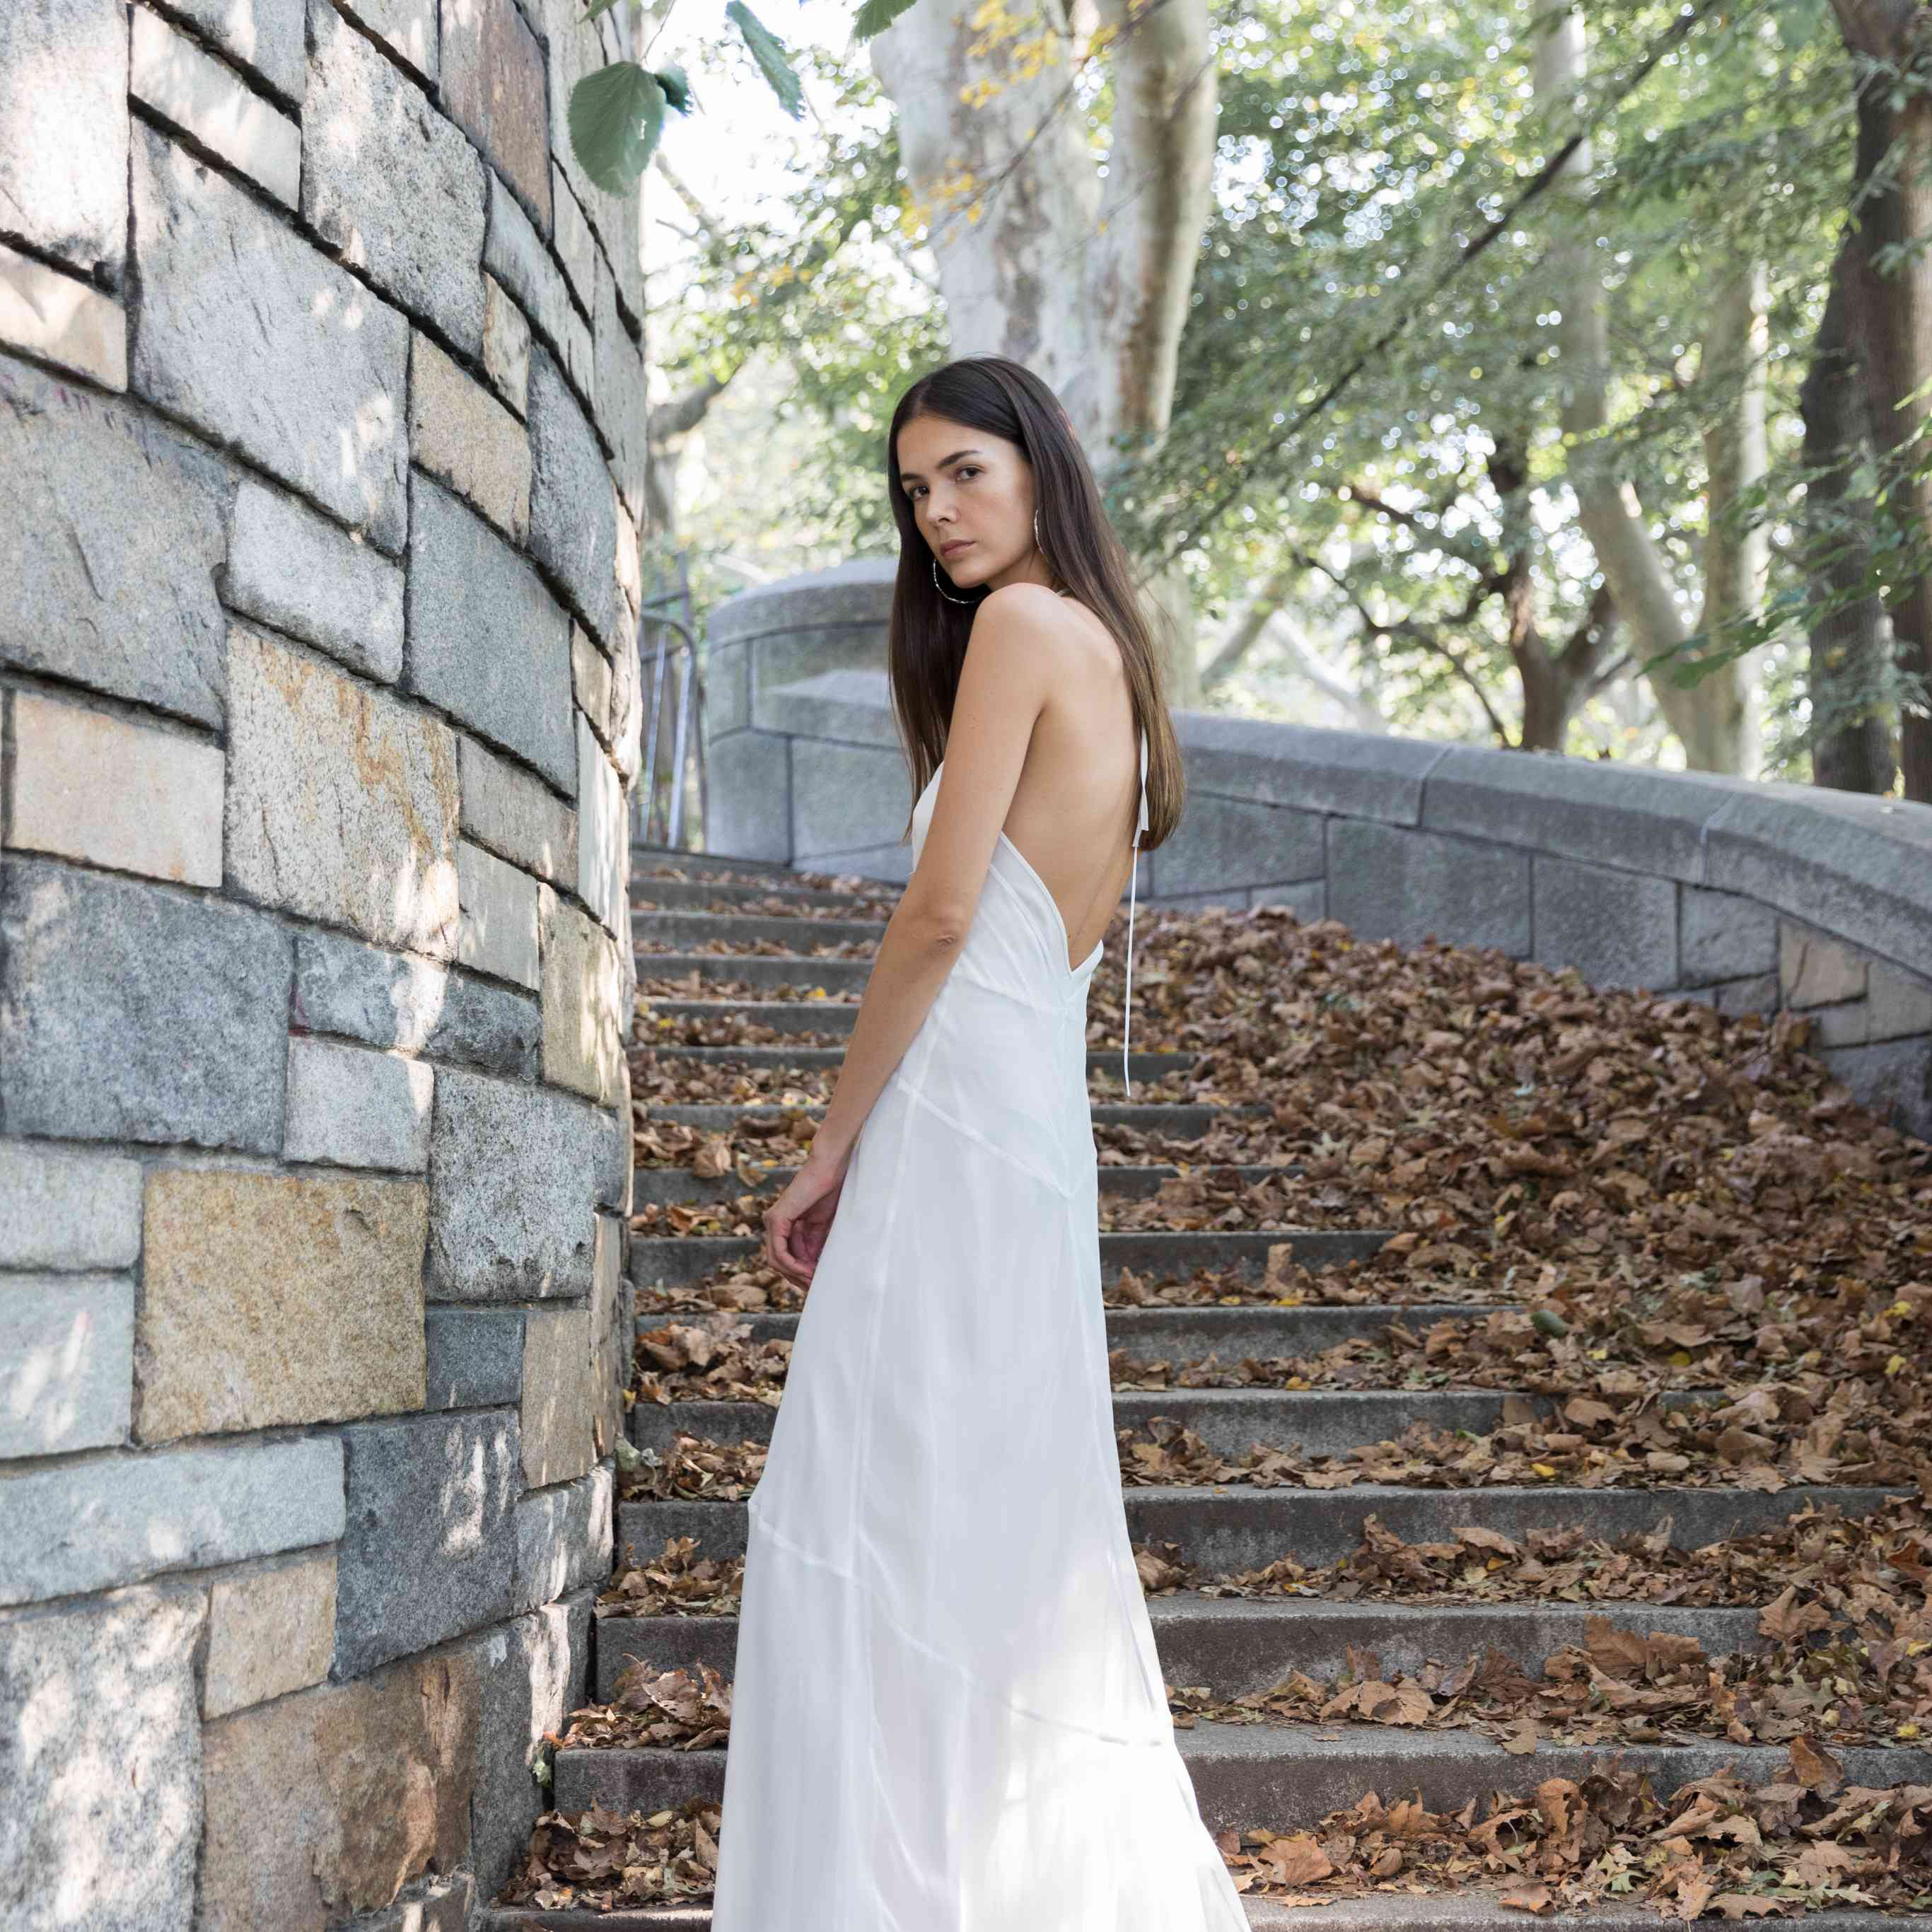 Model in halter chiffon wedding dress